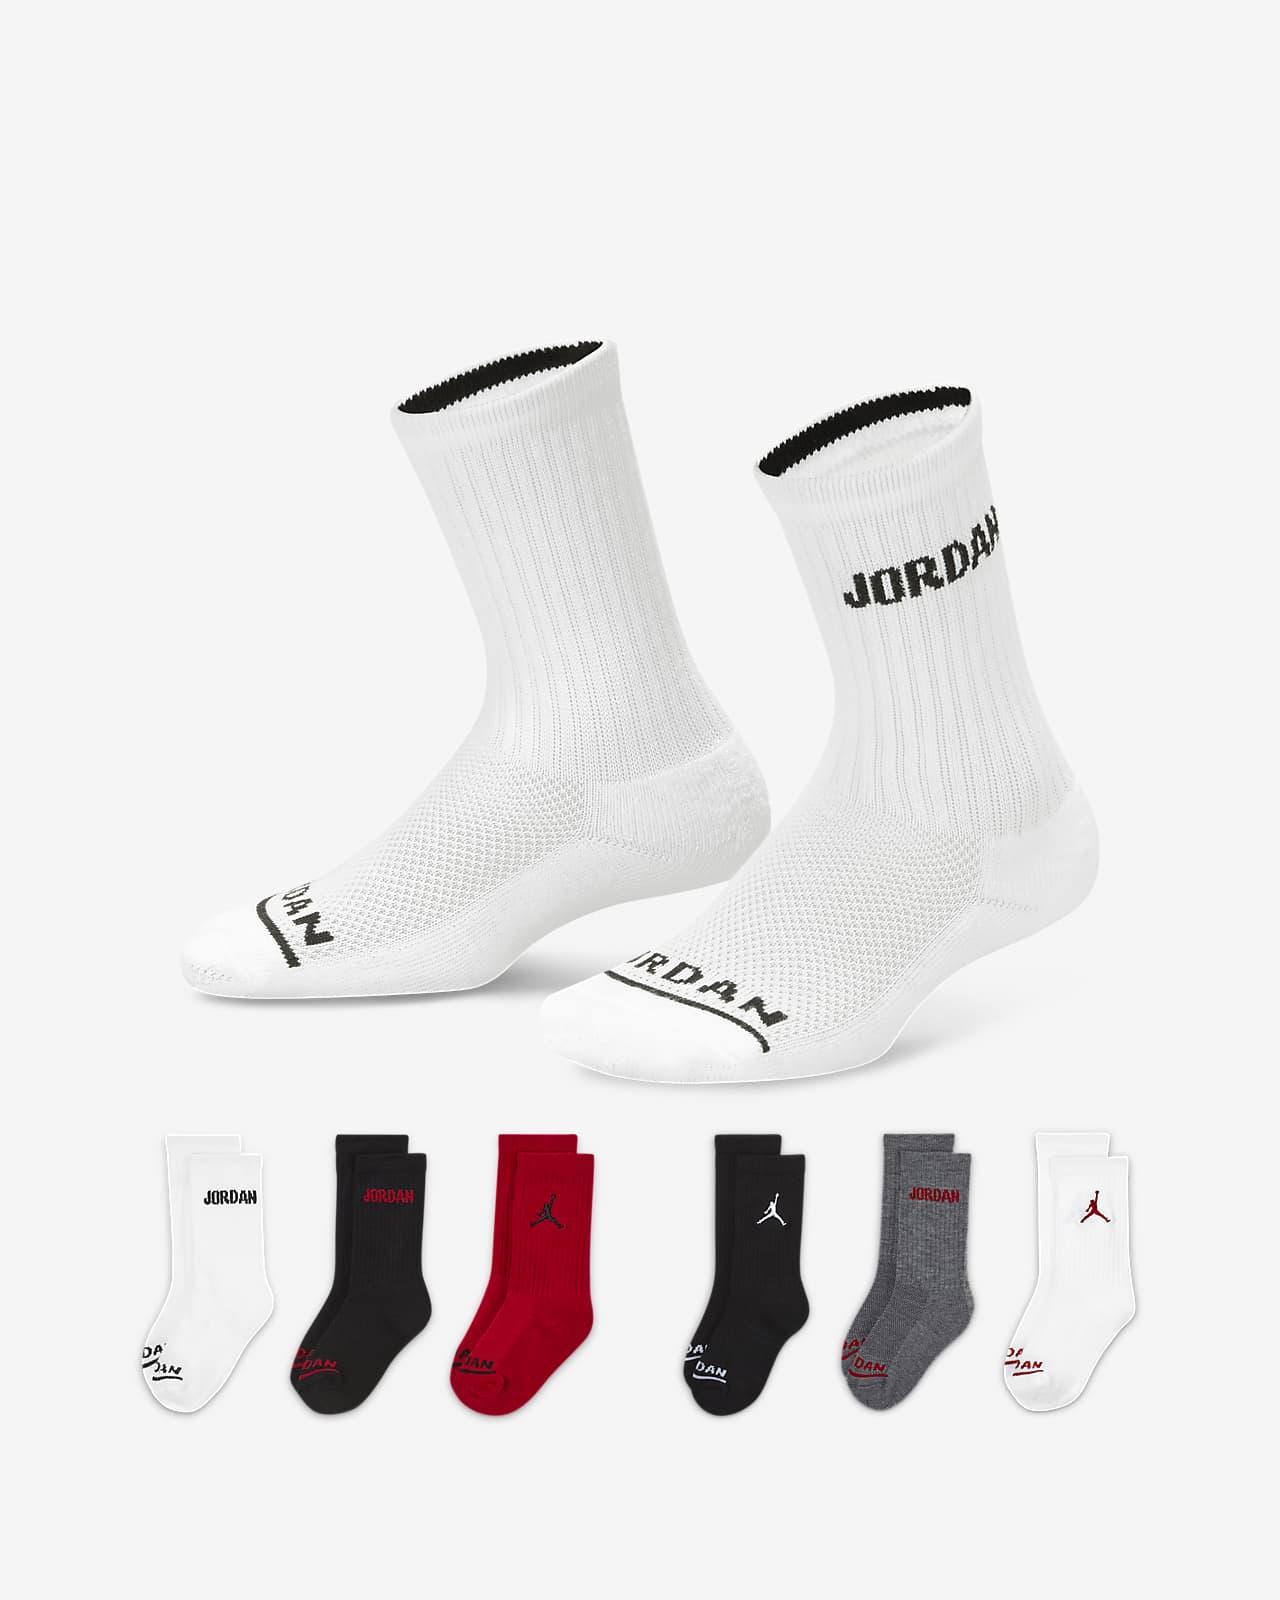 Jordan Little Kids' Ankle Socks (6 Pairs)